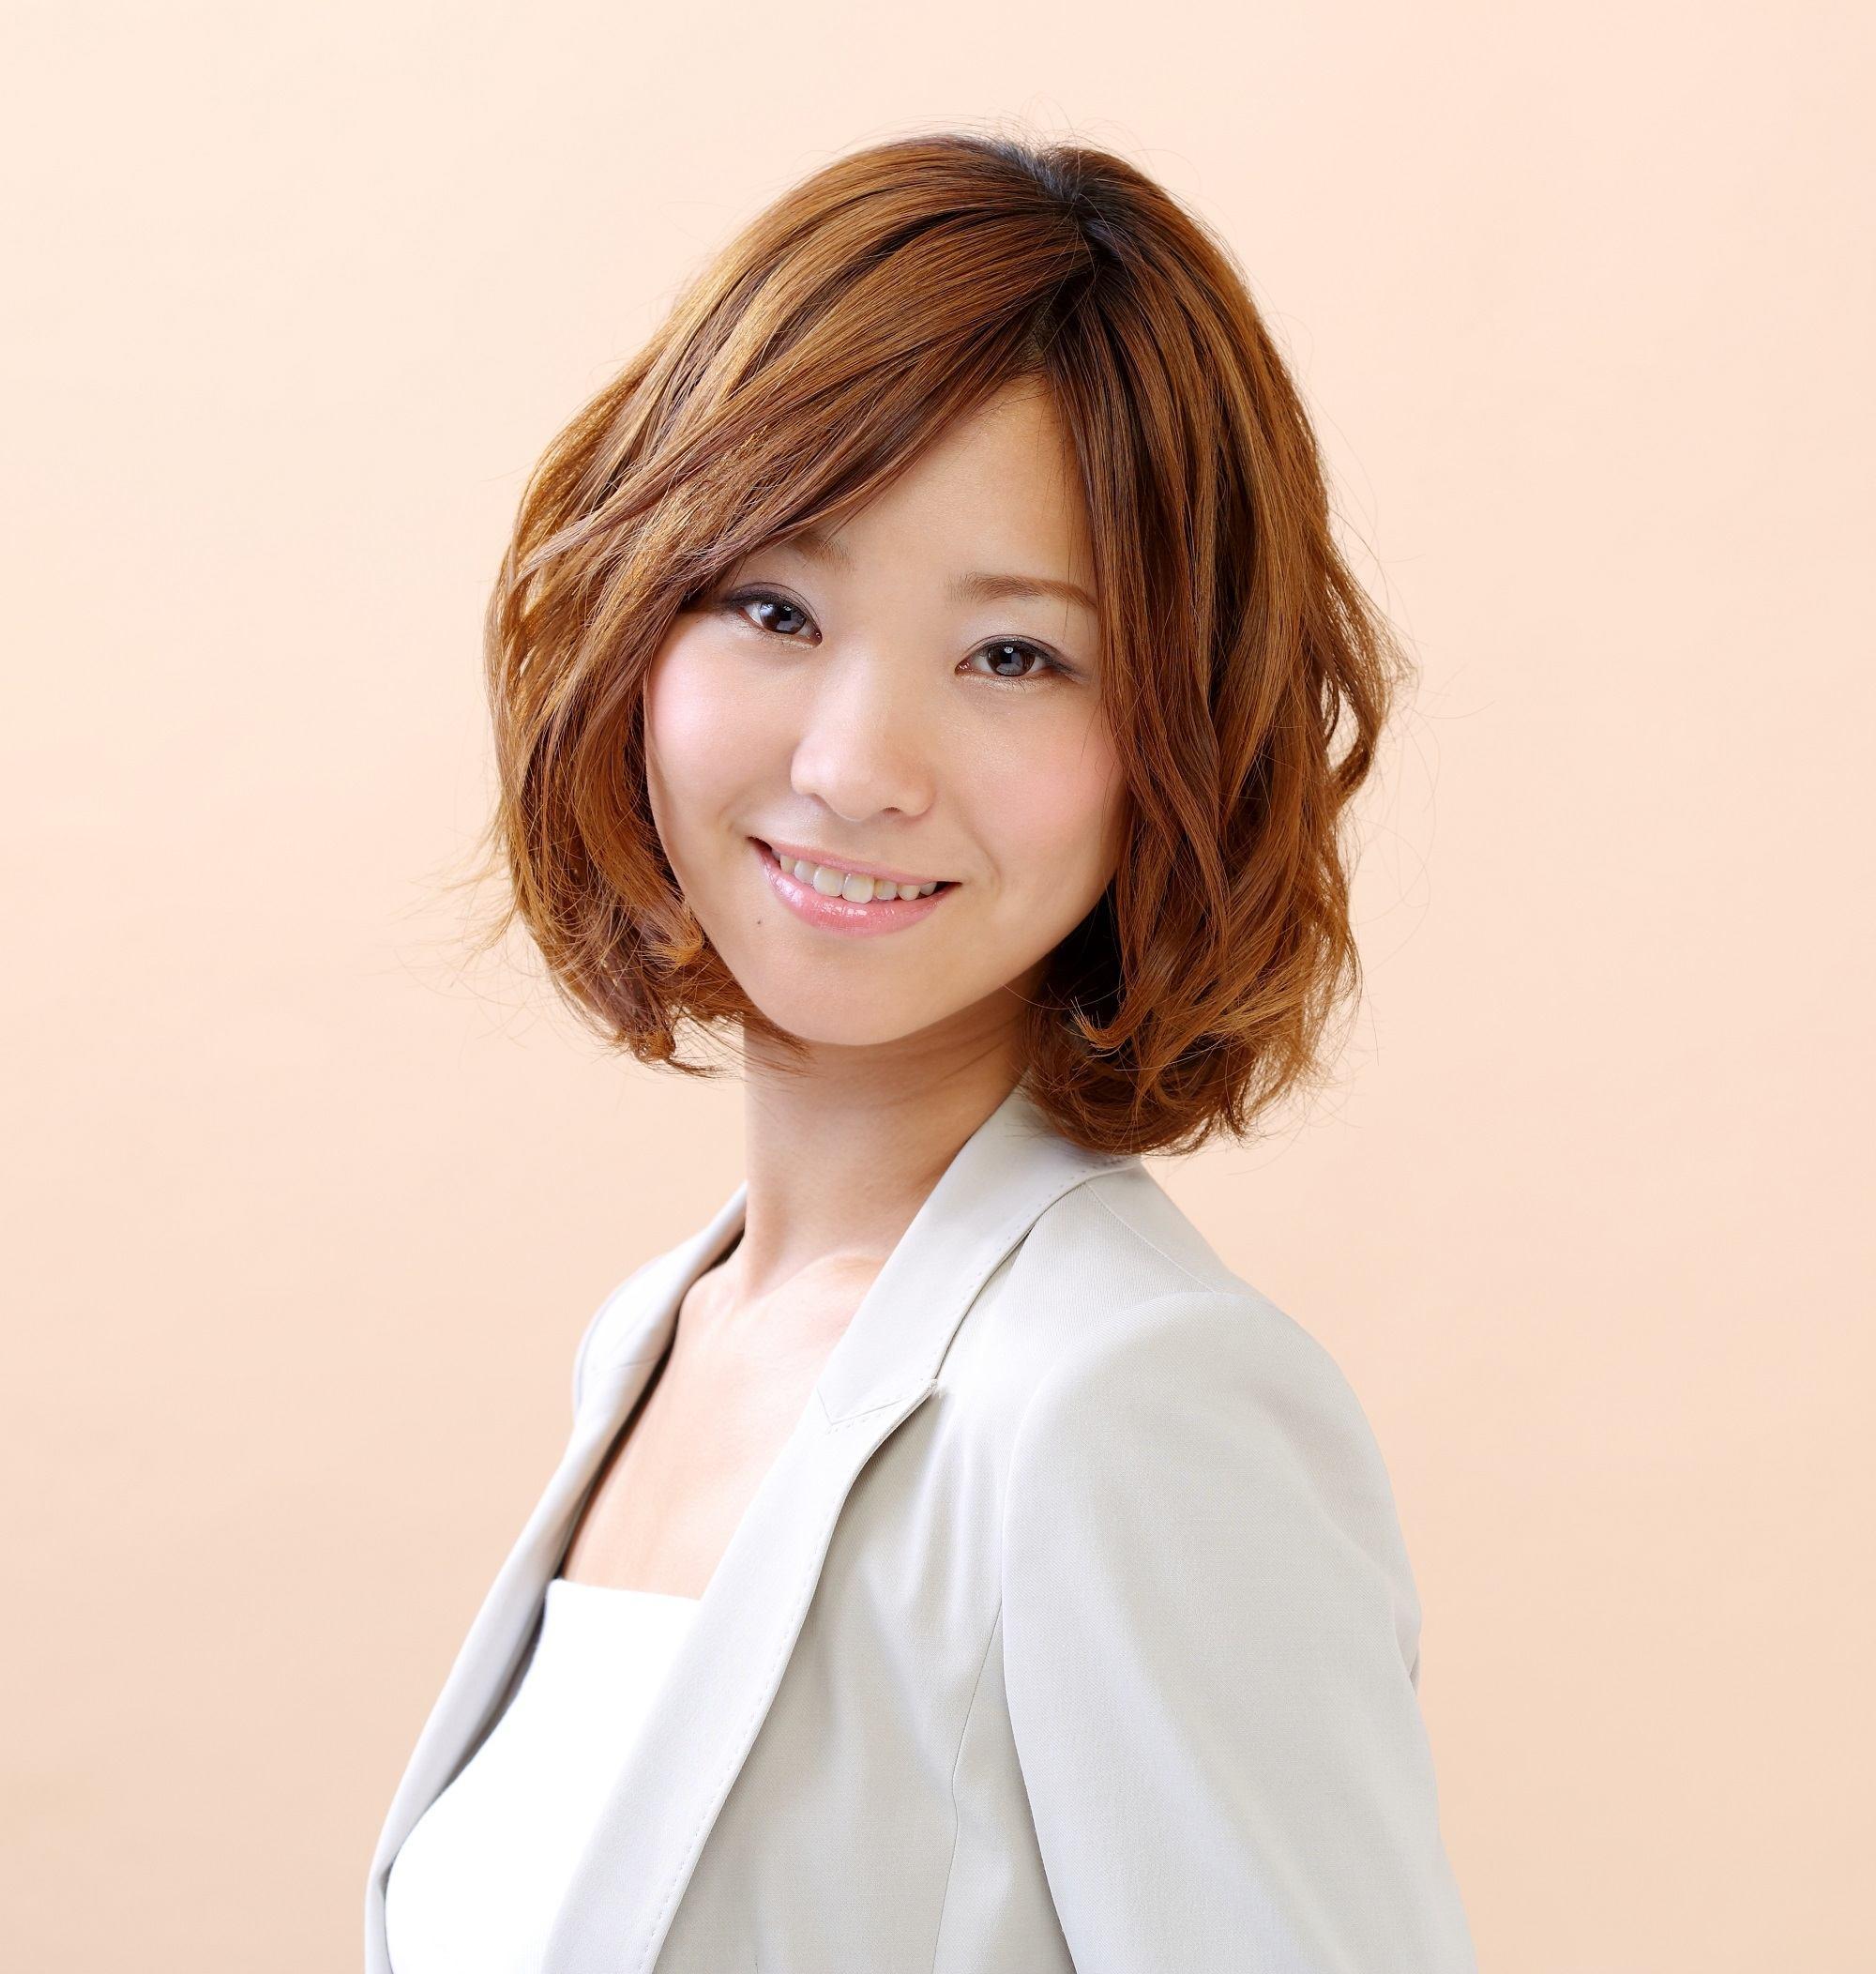 Layered haircuts with bangs: Closeup shot of an Asian woman with short wavy brown hair wearing a gray blazer